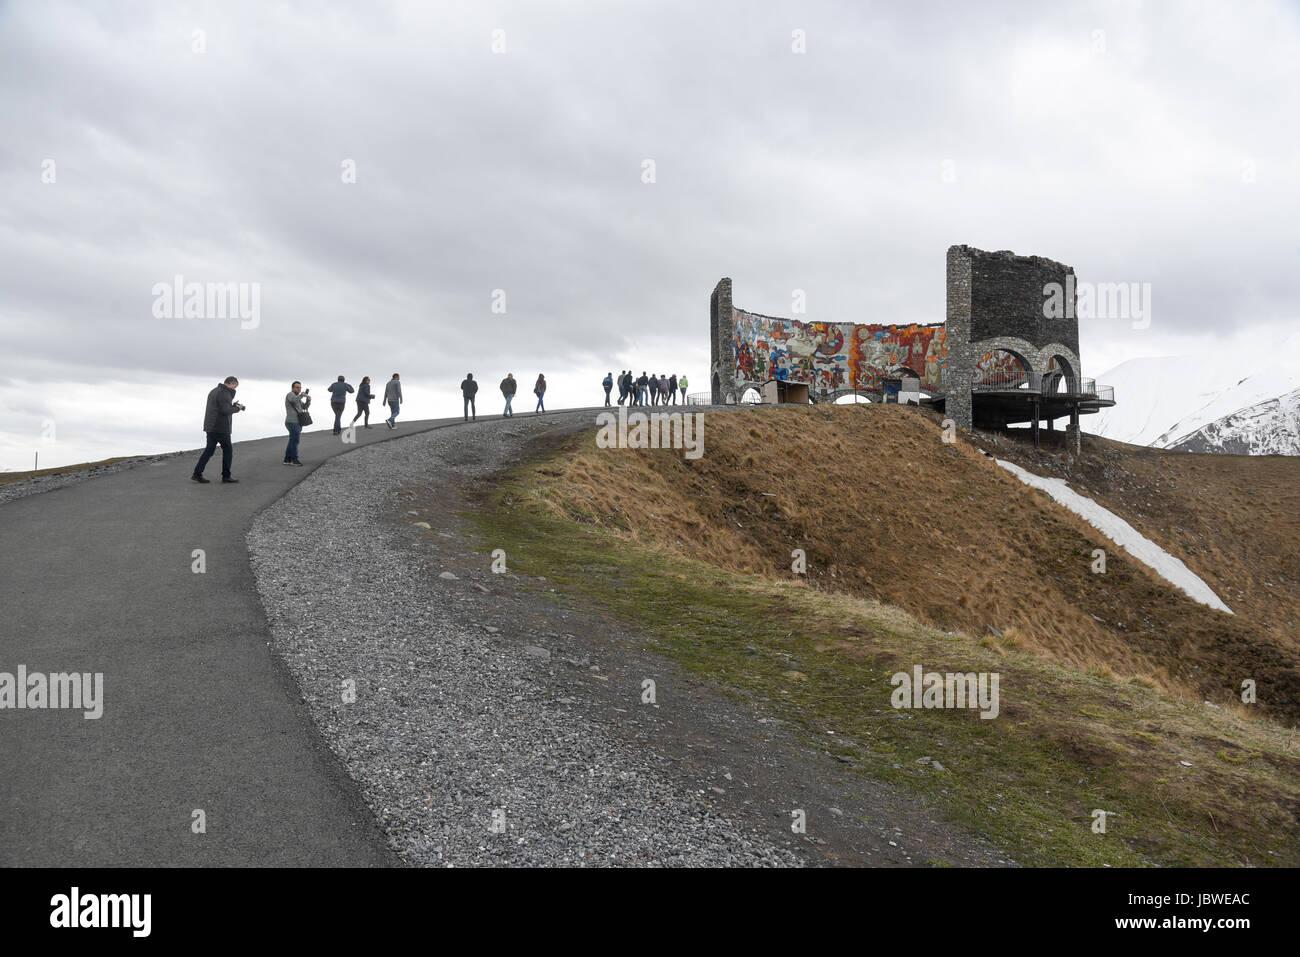 Georgia, la carretera militar de la era soviética, Monumento a la amistad de Rusia Georgia Foto de stock